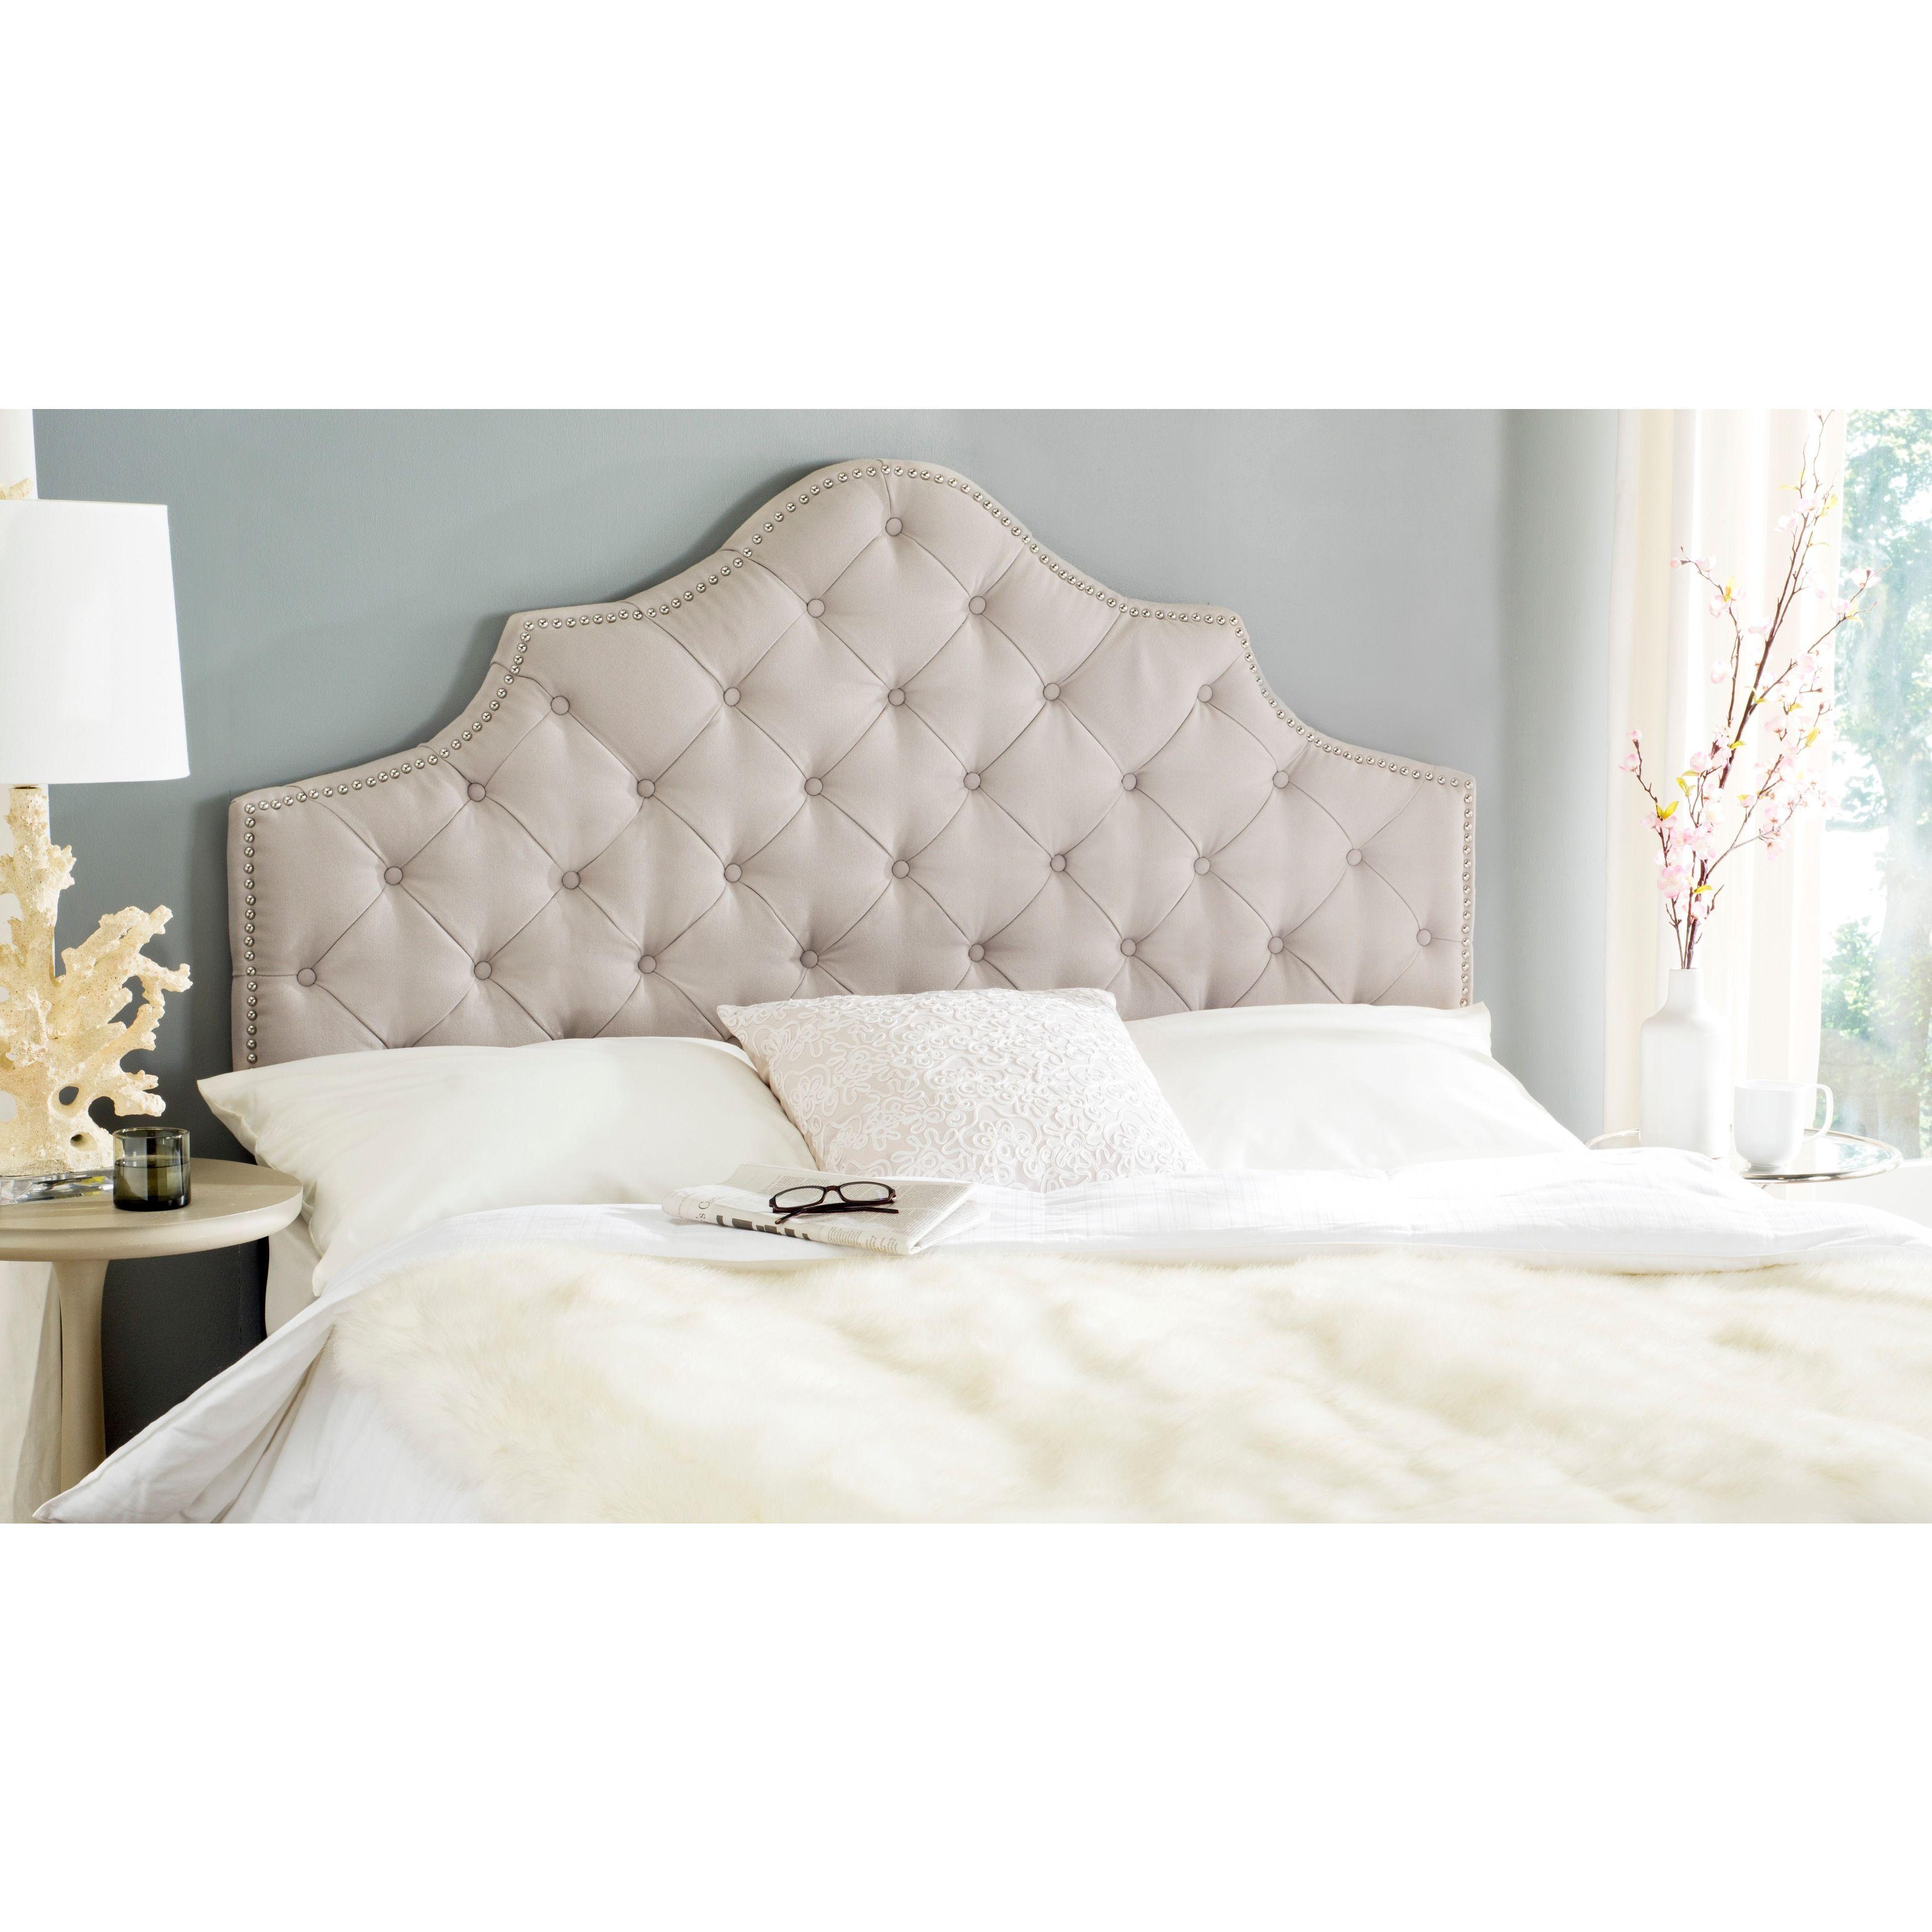 Safavieh Arebelle Taupe Linen Upholstered Tufted Headboard - Silver ...